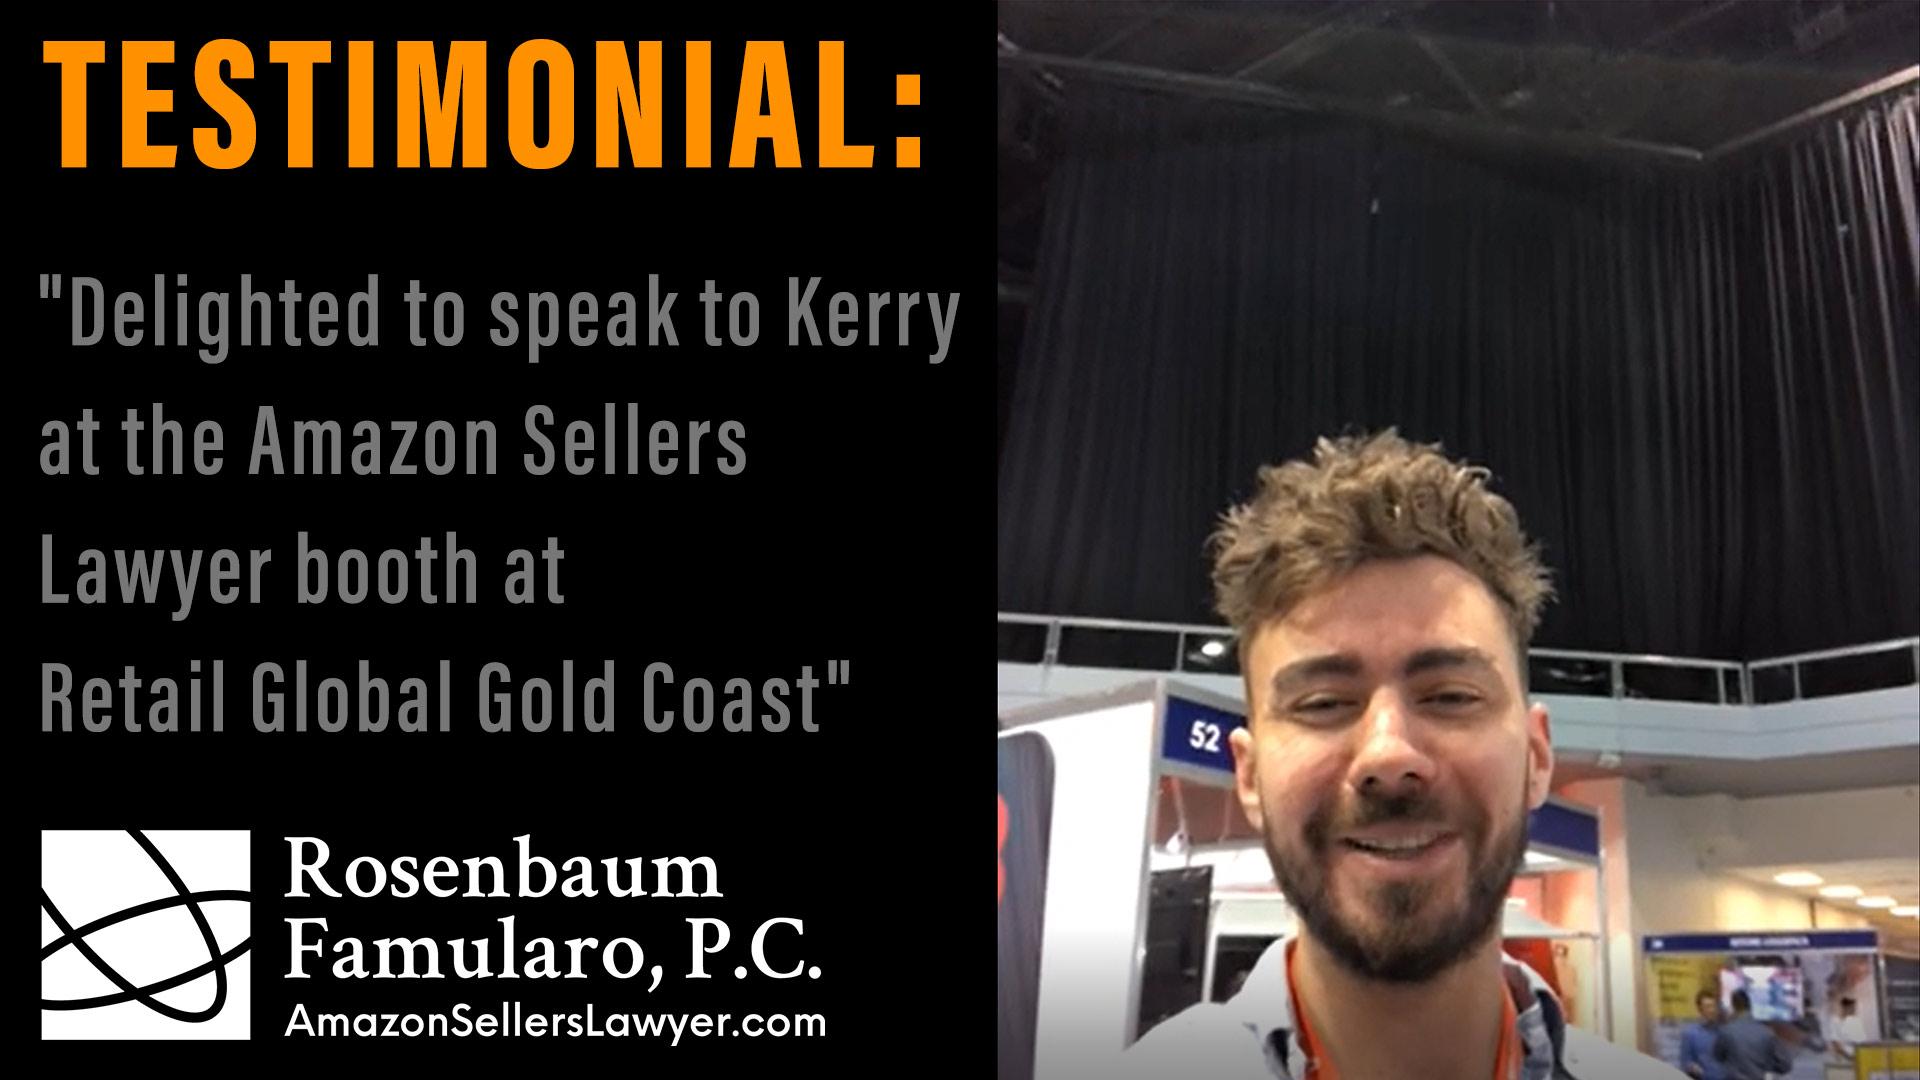 Amazon Sellers Lawyer Testimonials: Retail Global Gold Coast